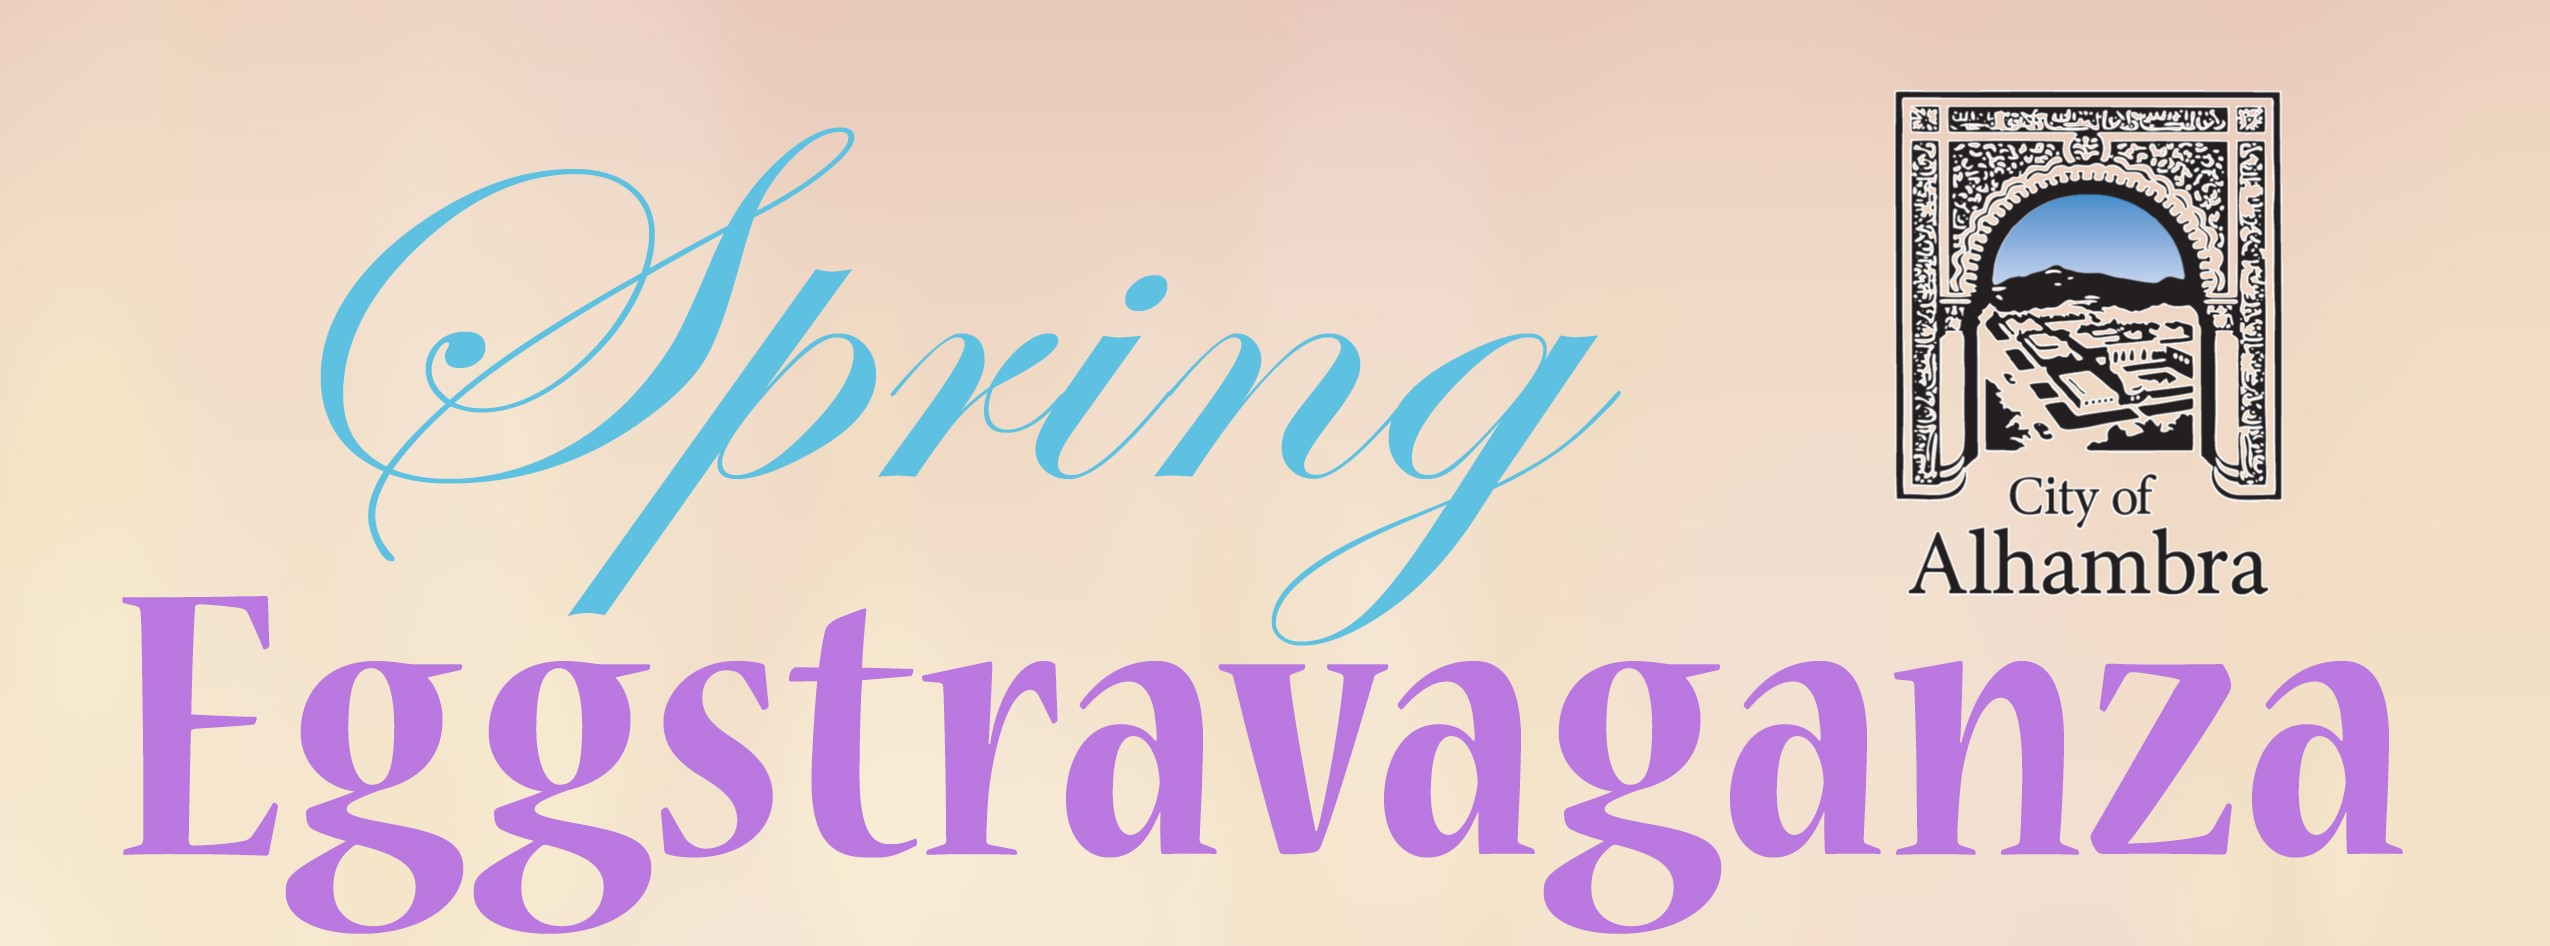 City of Alhambra Spring Eggstravaganza Logo